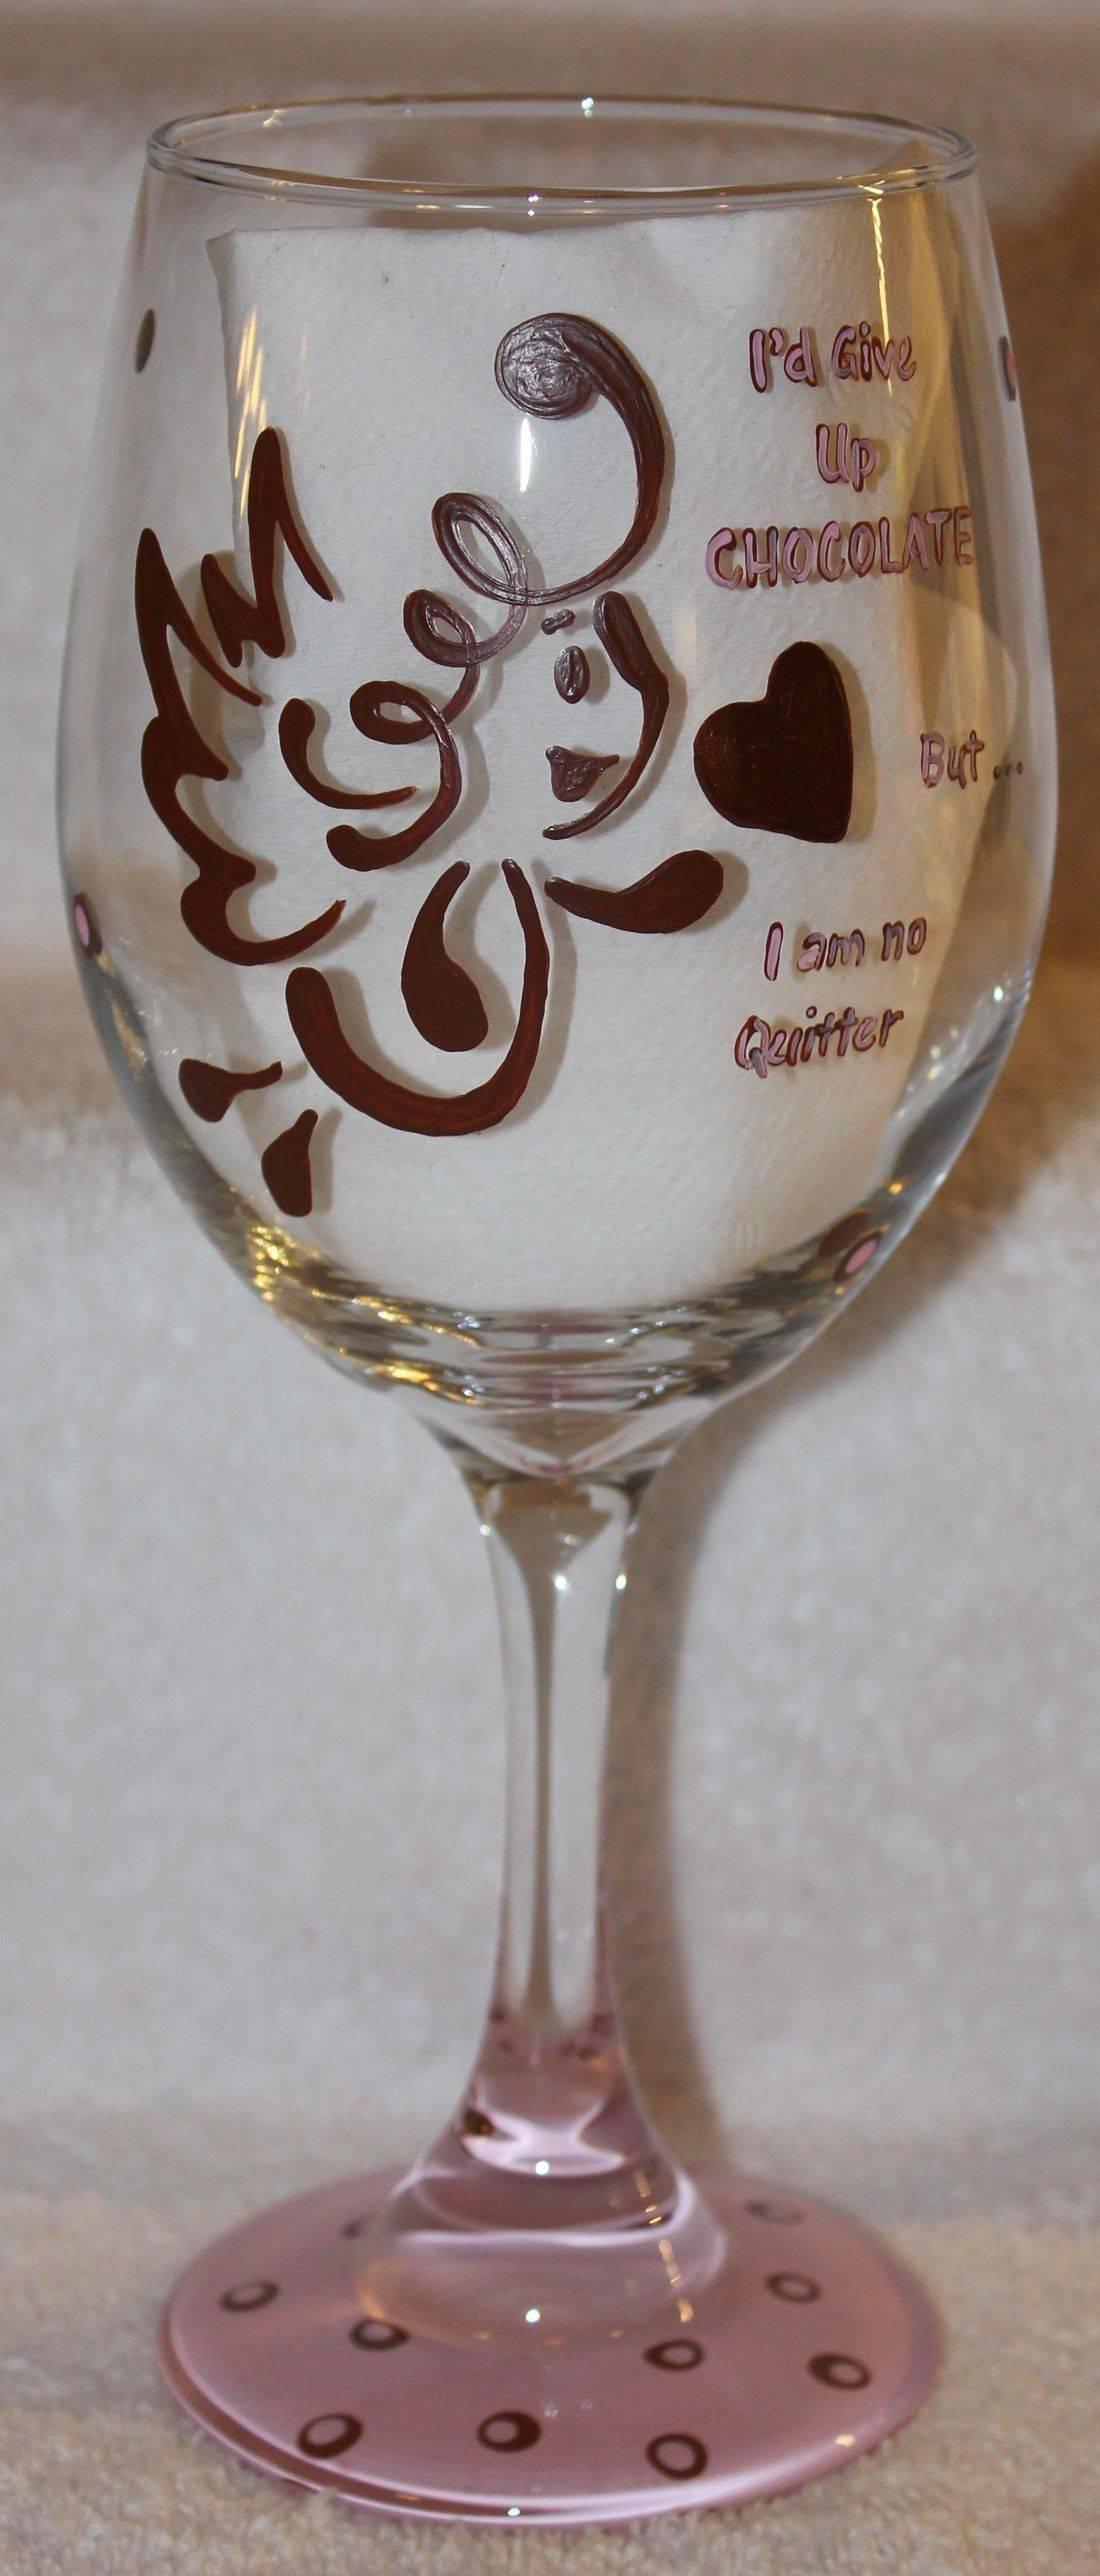 Chocolate wine glass, chocolate glass